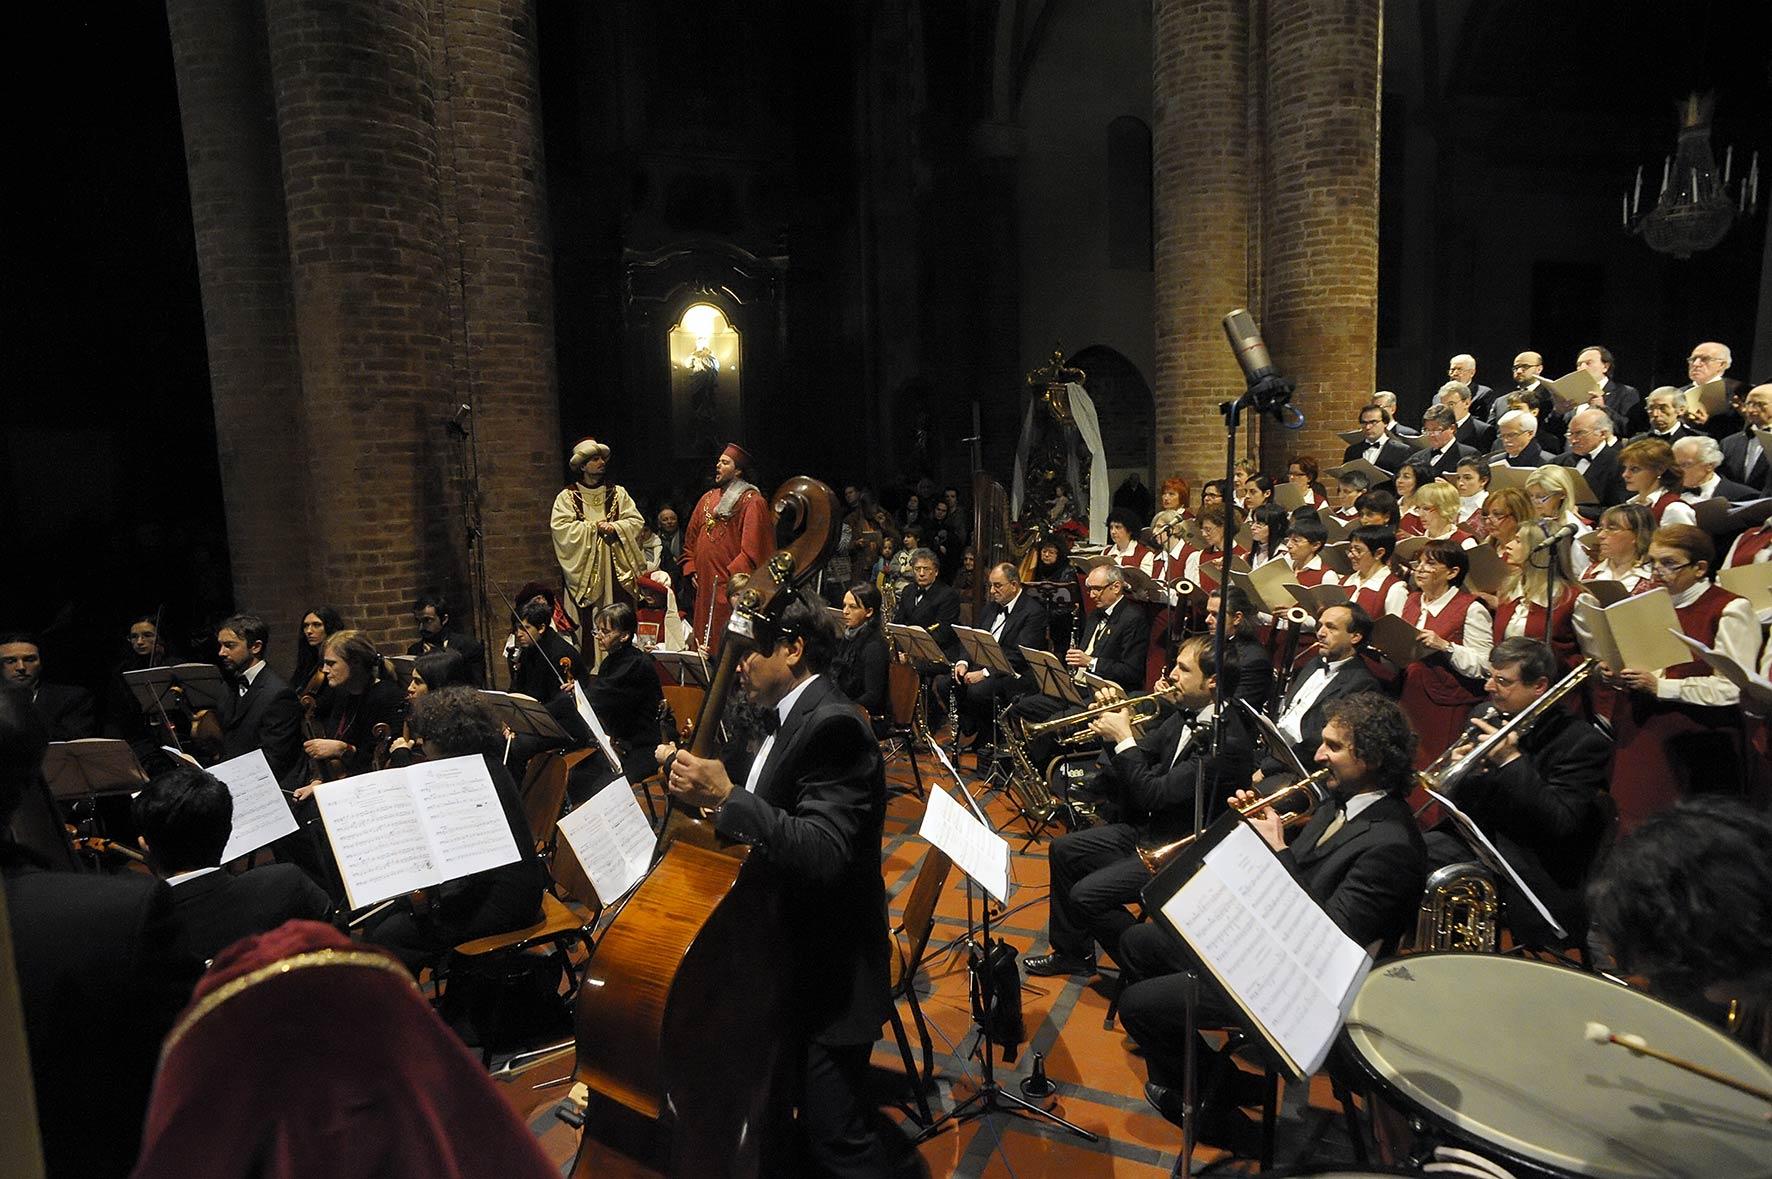 Sinfonico Honolulu feat. Mauro Ermanno Giovanardi stasera ad AstiMusica